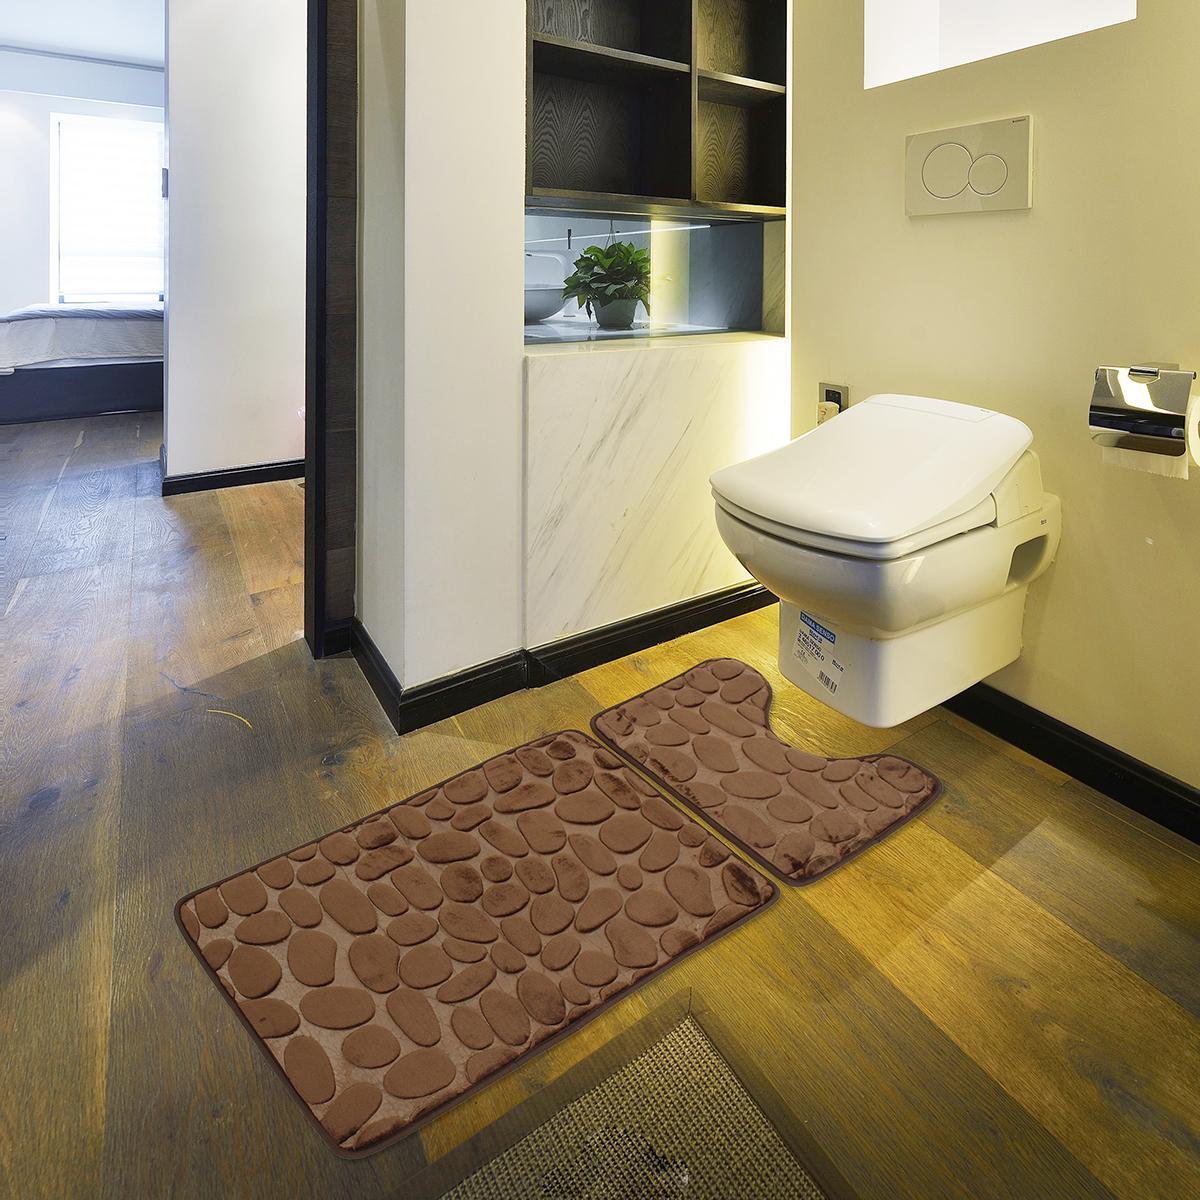 2pcs Set Bath Non Slip Mat Toilet Contour Cover Rug Bathroom Floor Stone Pattern Brown Buy Online At Best Prices In Bangladesh Daraz Com Bd